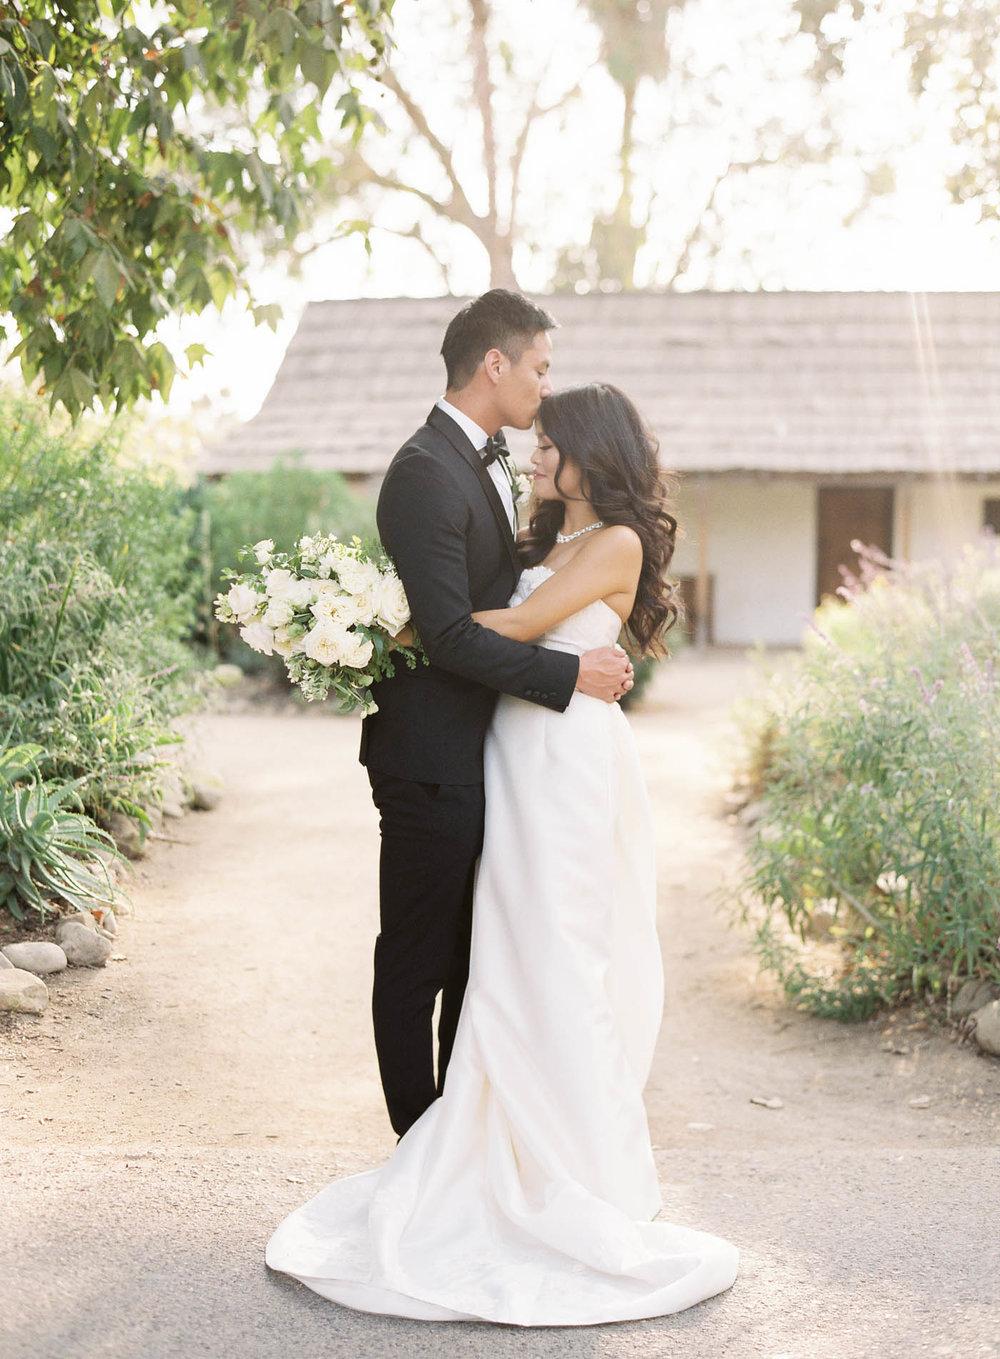 franciscan-gardens-wedding-16-Jen_Huang-000759-R1-015.jpg